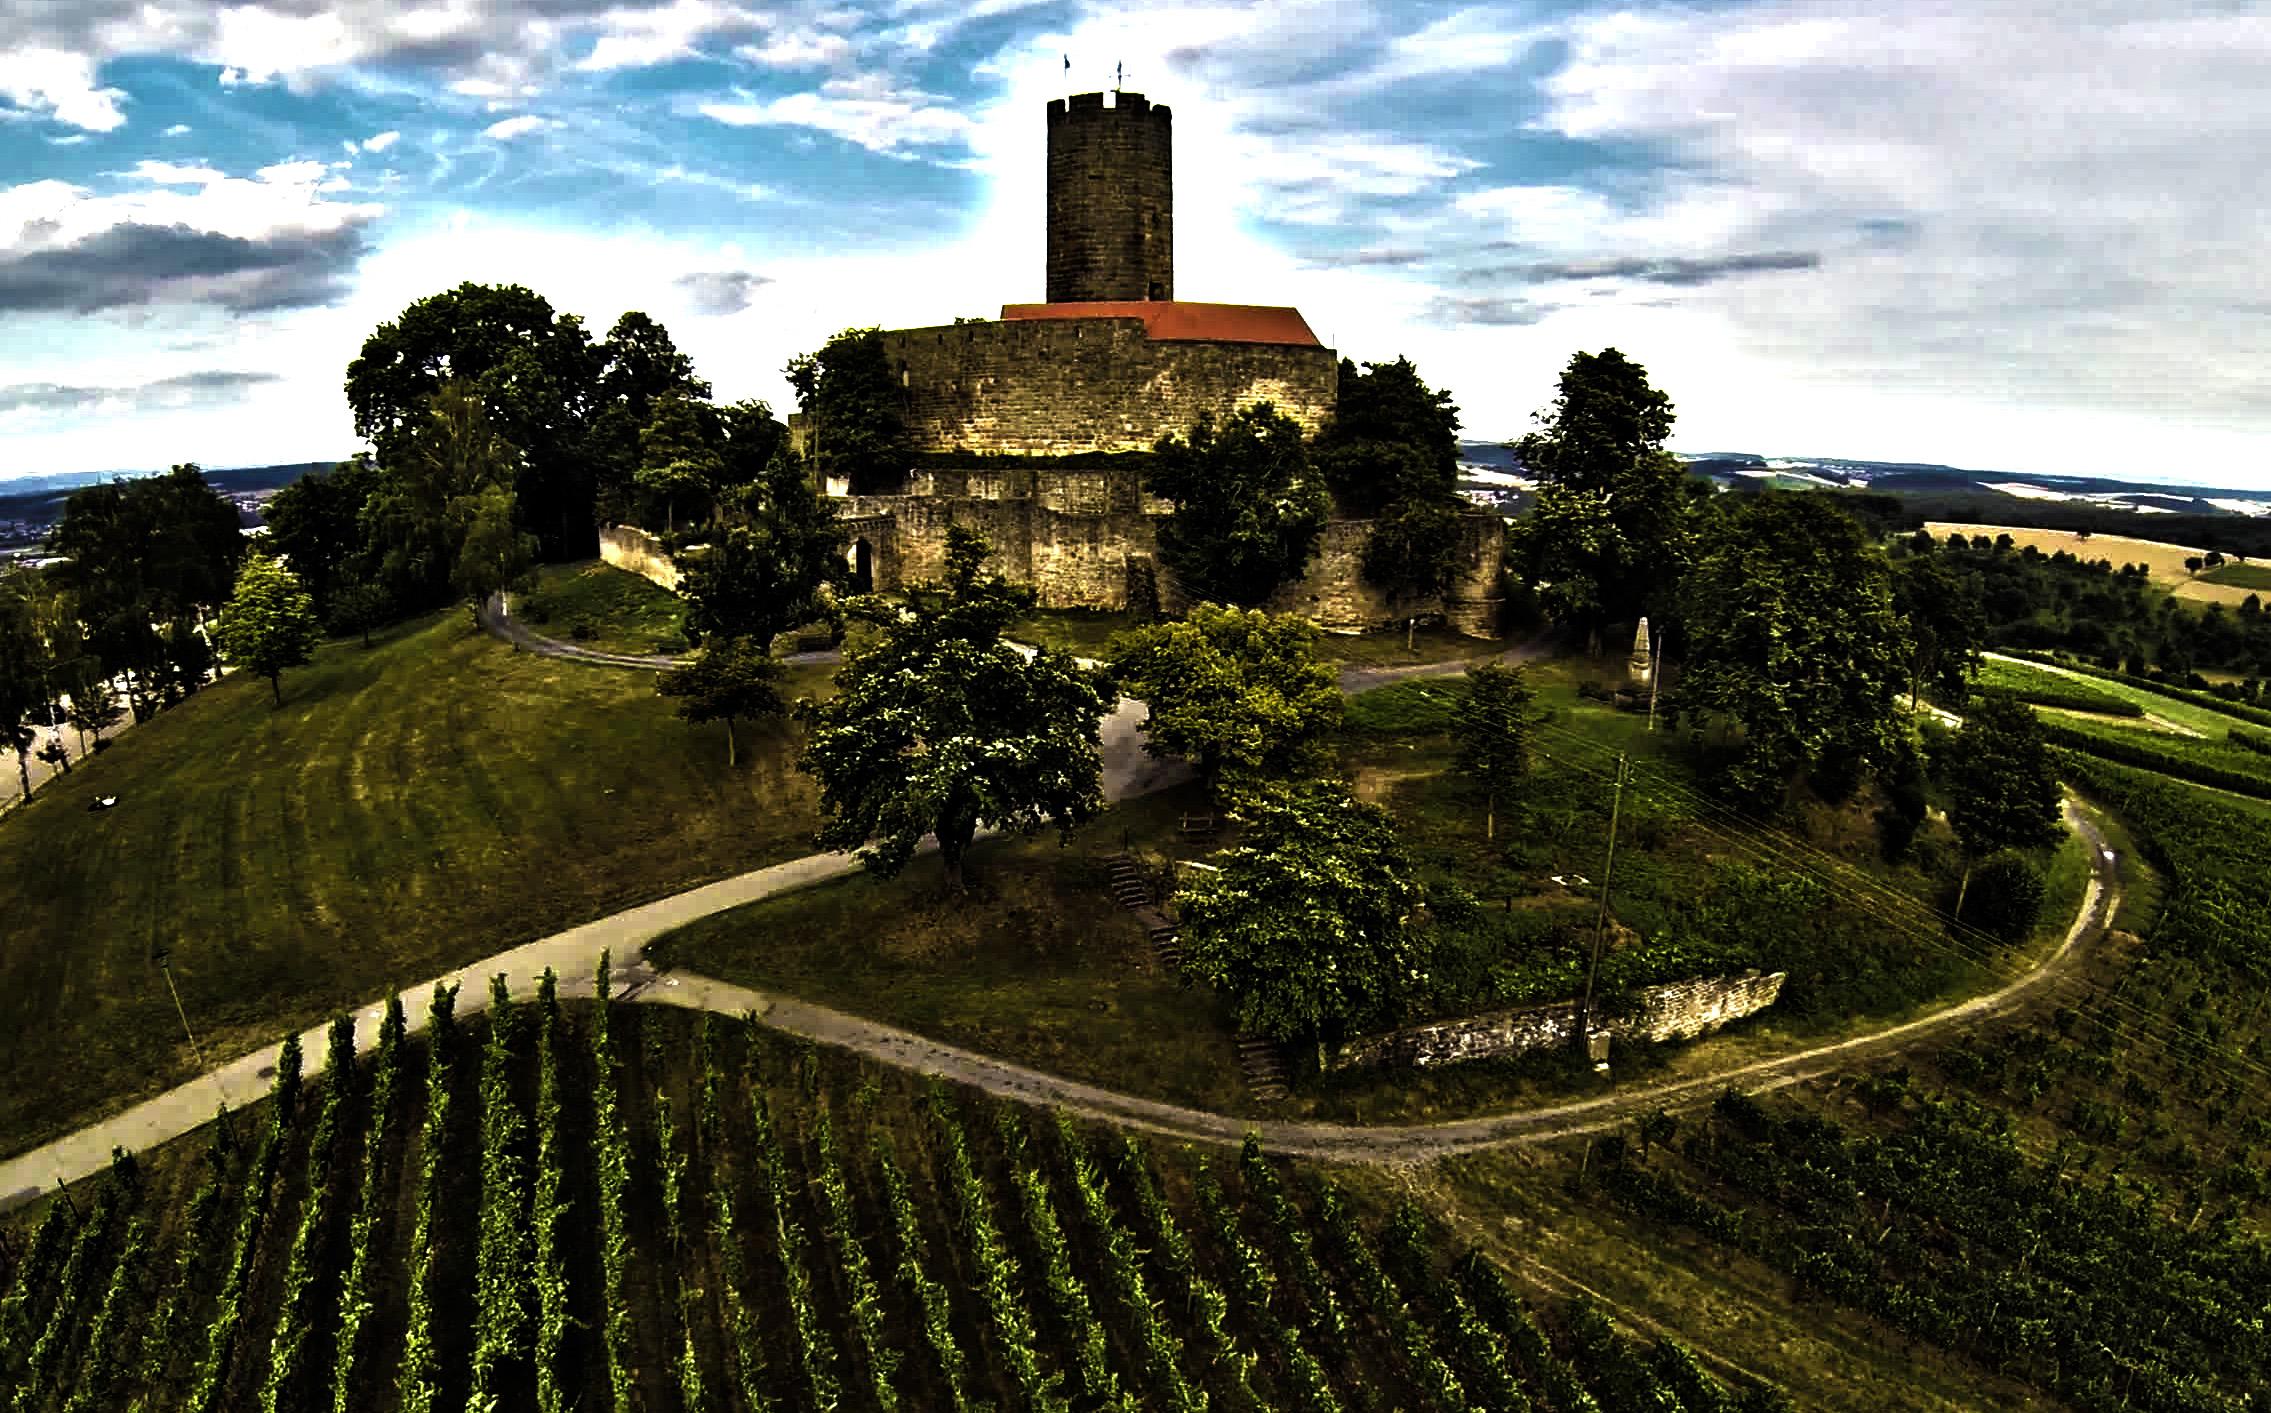 Sinsheim, Germany